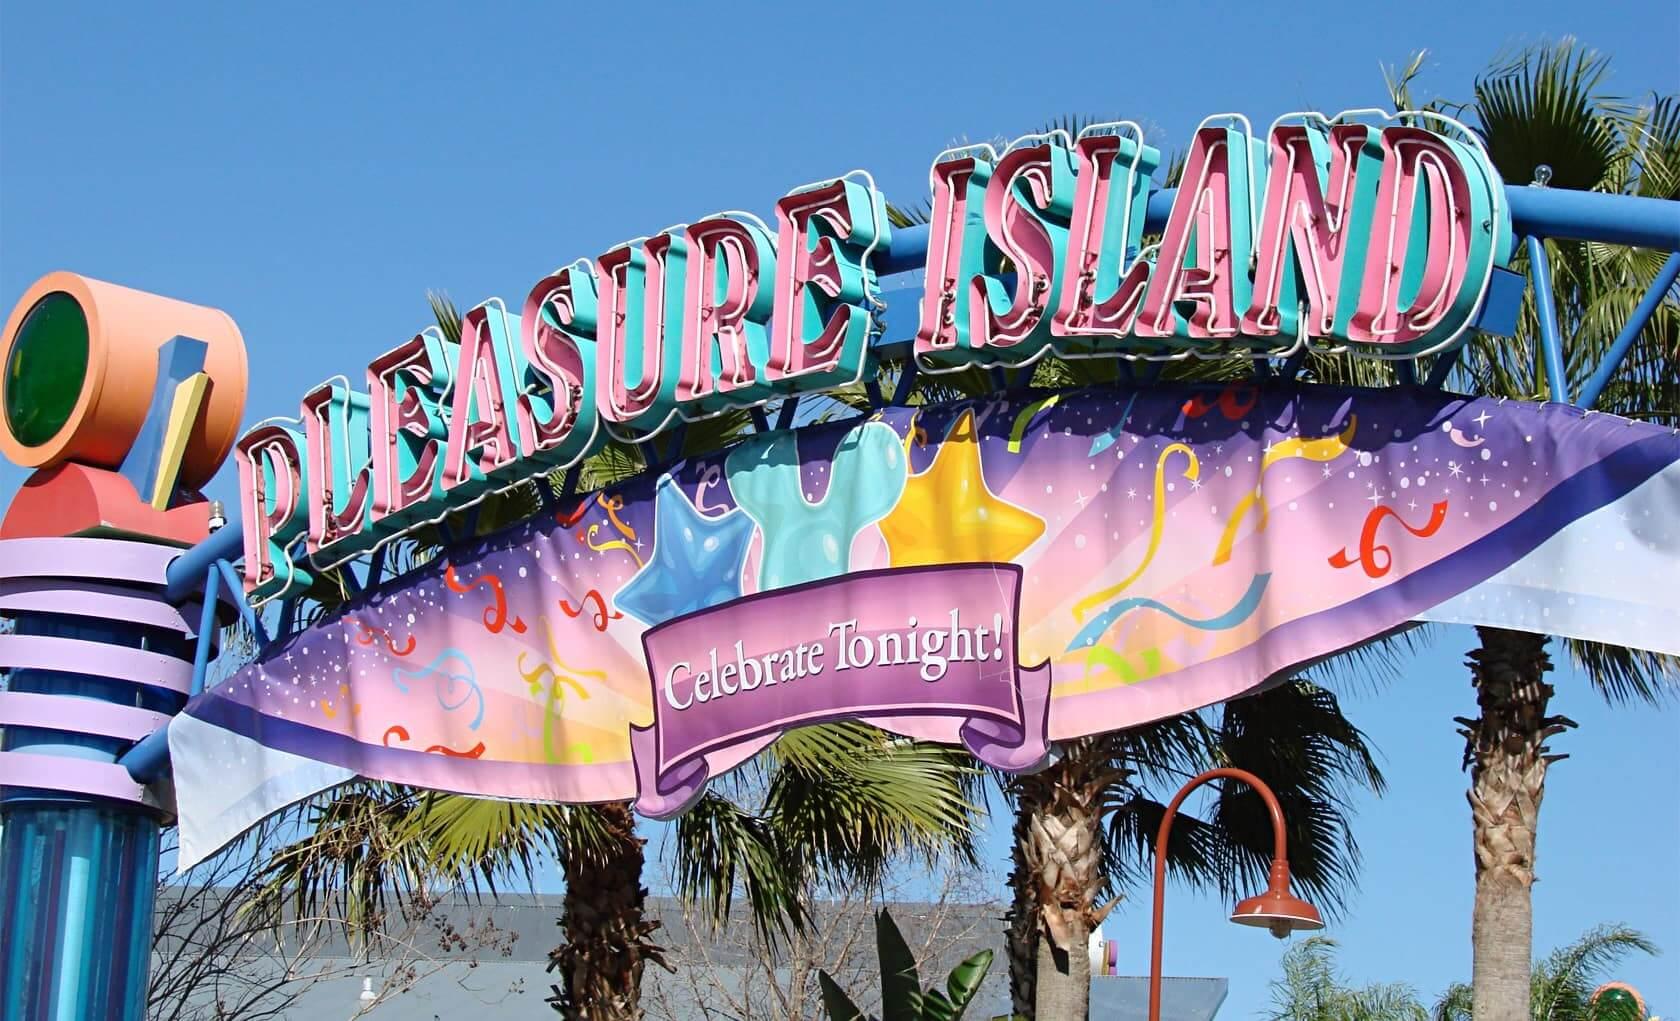 Downtown Disney Orlando: Pleasure Island